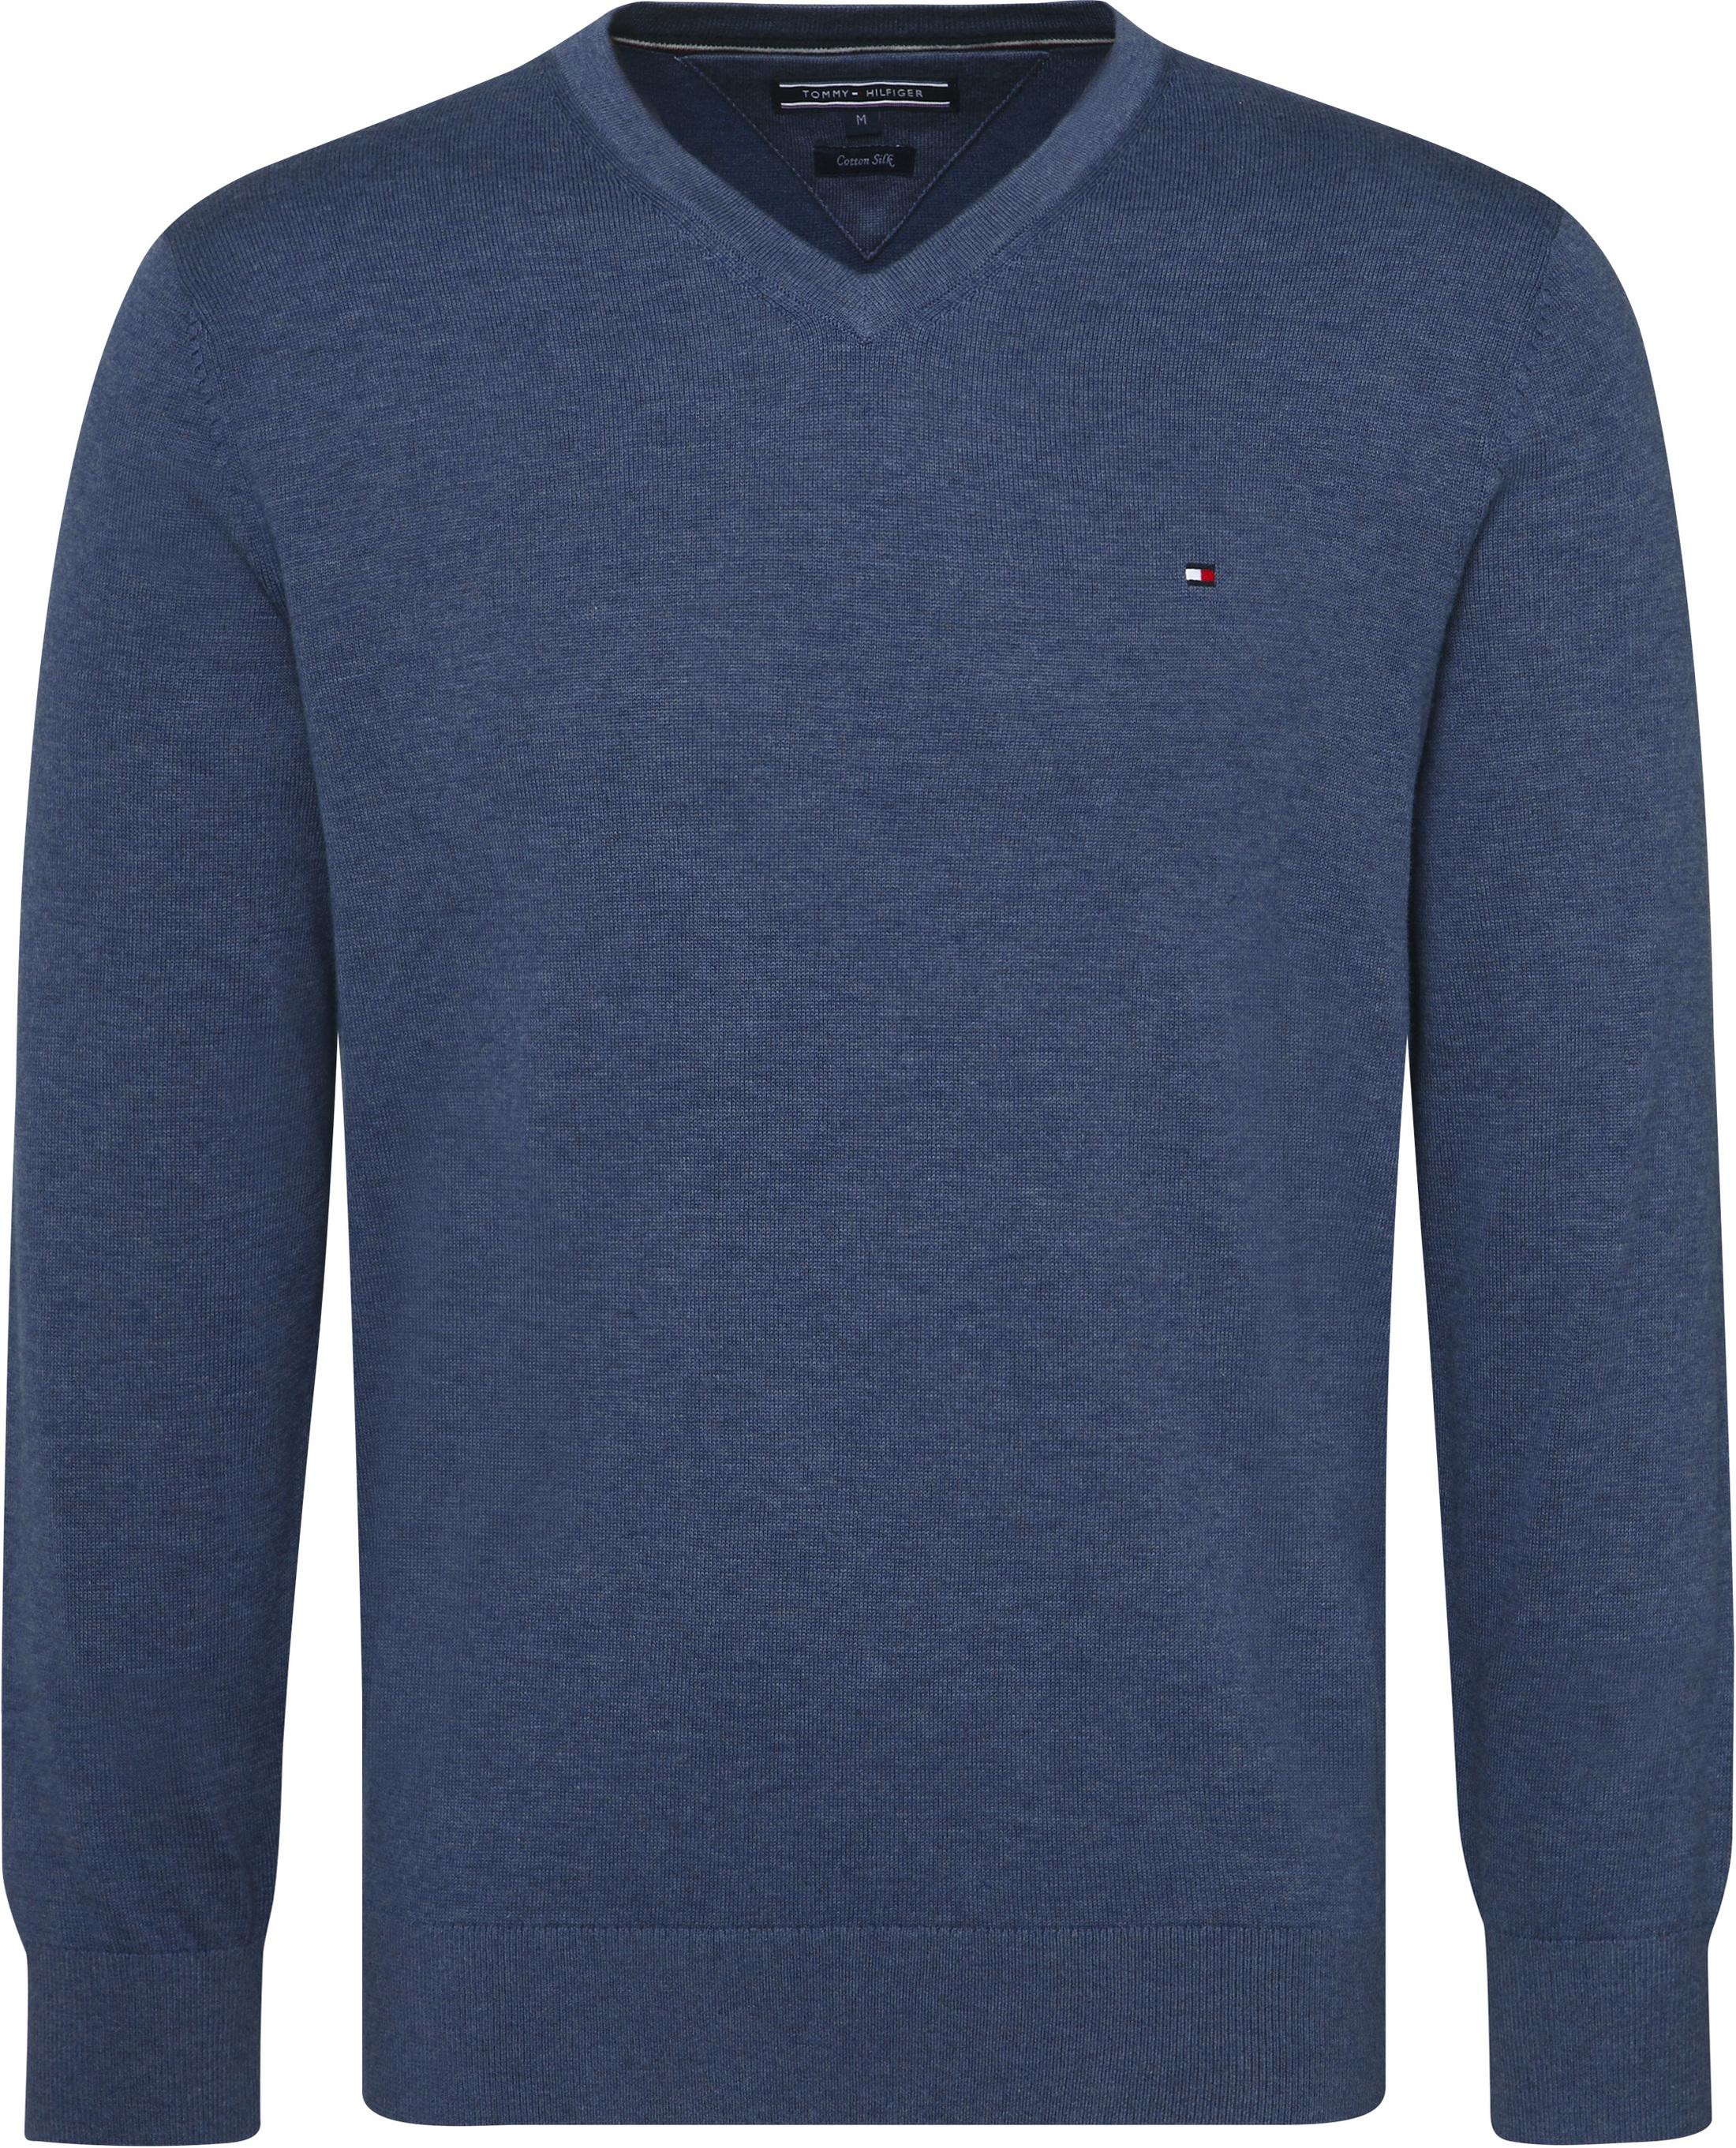 Tommy Hilfiger Pullover V-Hals Indigo Blauw foto 0